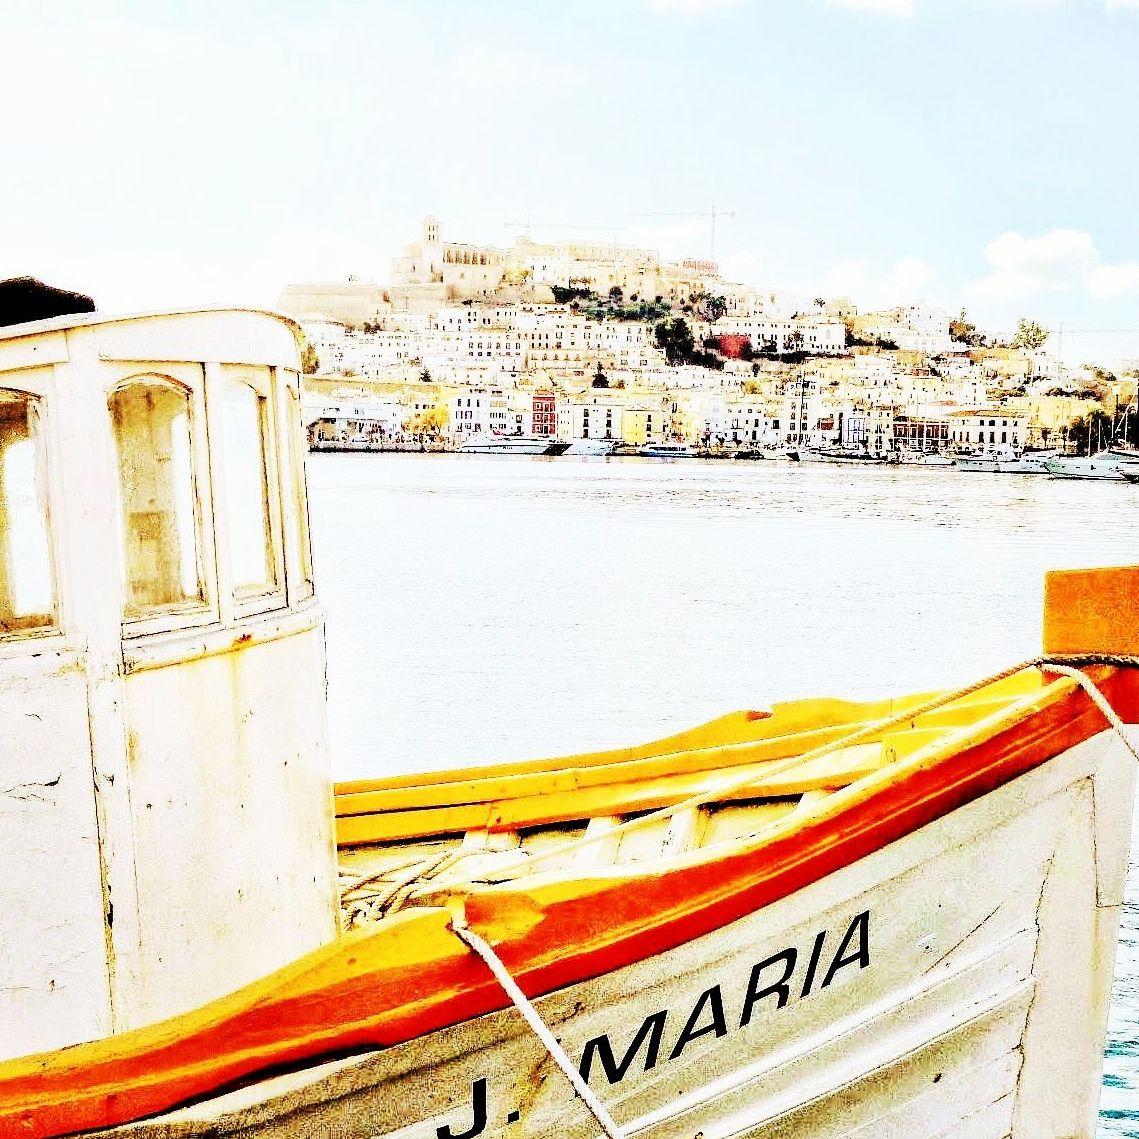 Foto 23 de Abogados en Eivissa | Raad Abogados. Tel 691 270 993